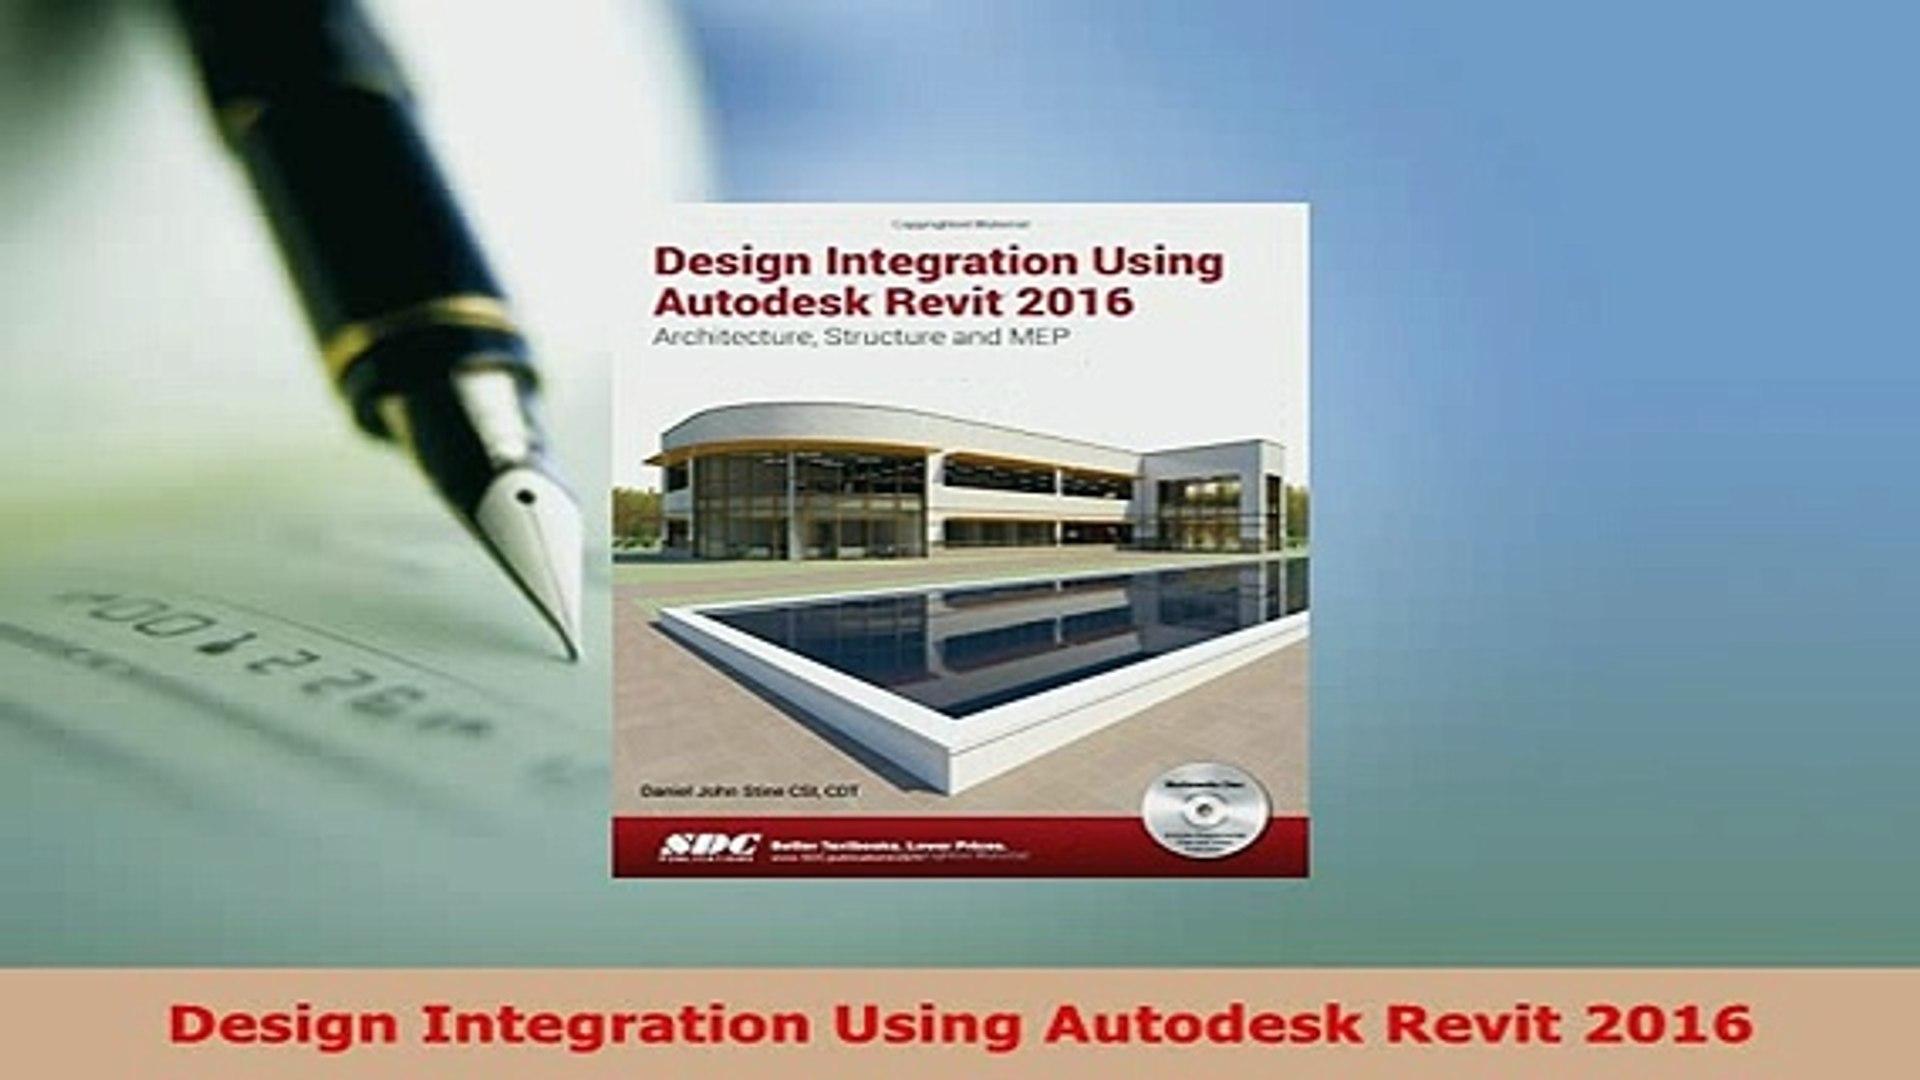 design integration using autodesk revit 2016 pdf download